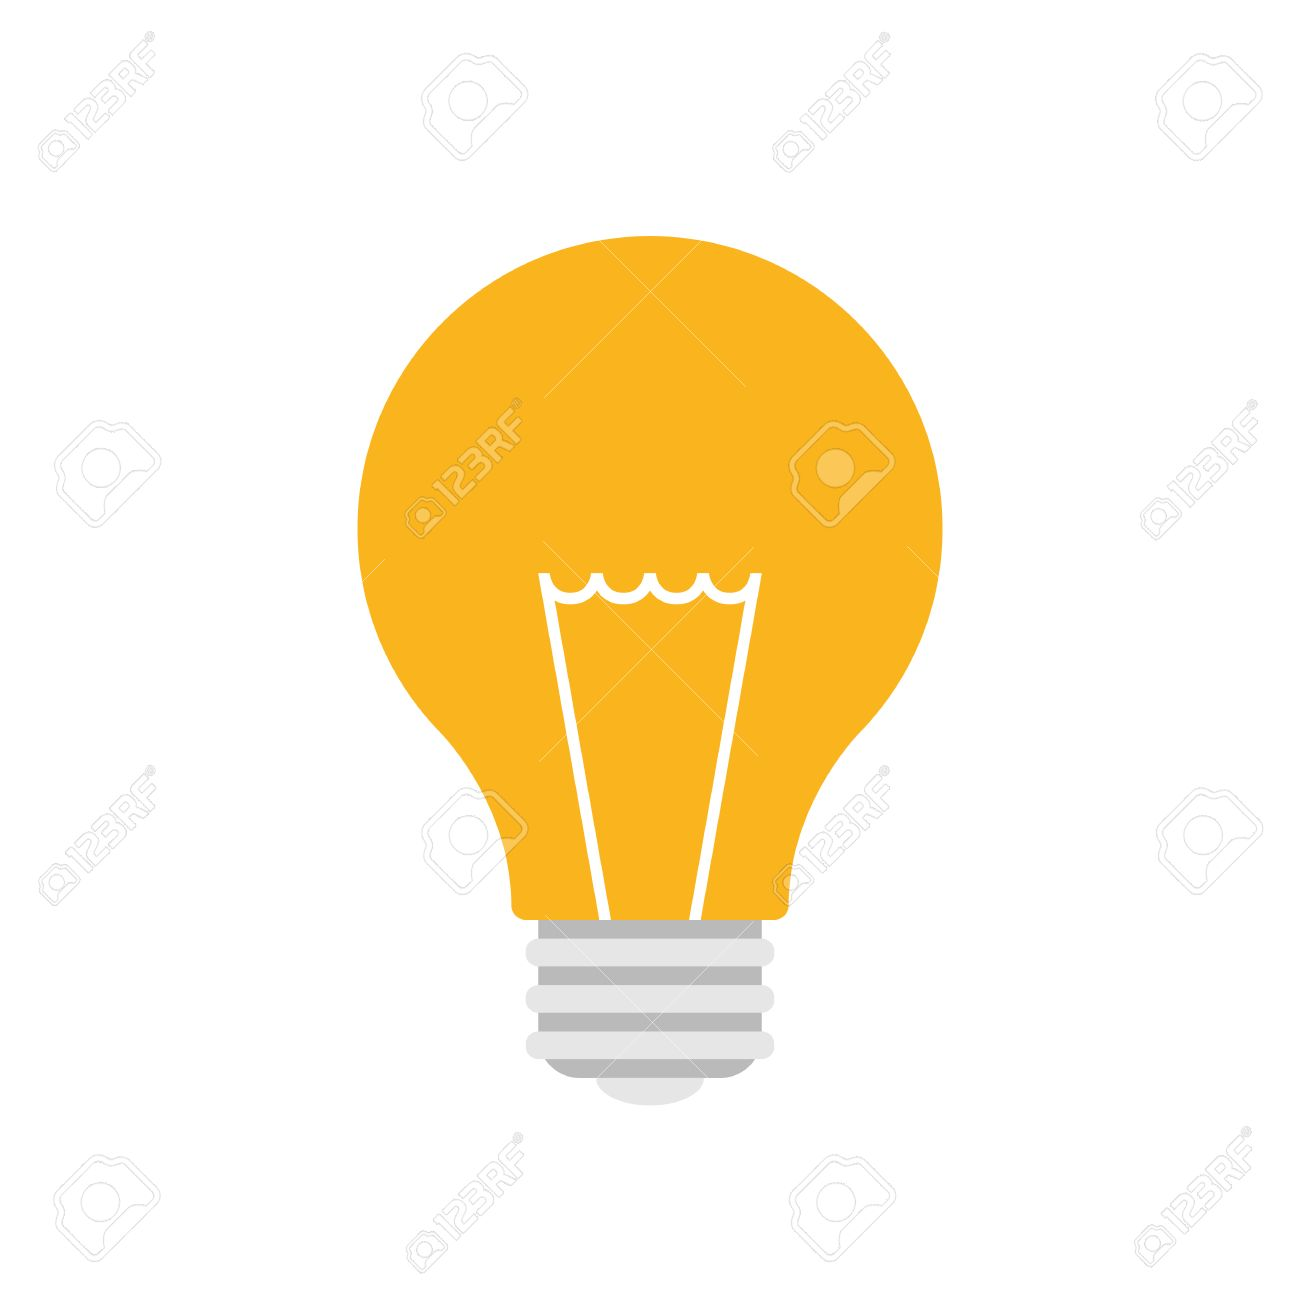 Light bulb icon, modern minimal flat design style, vector illustration - 46784335